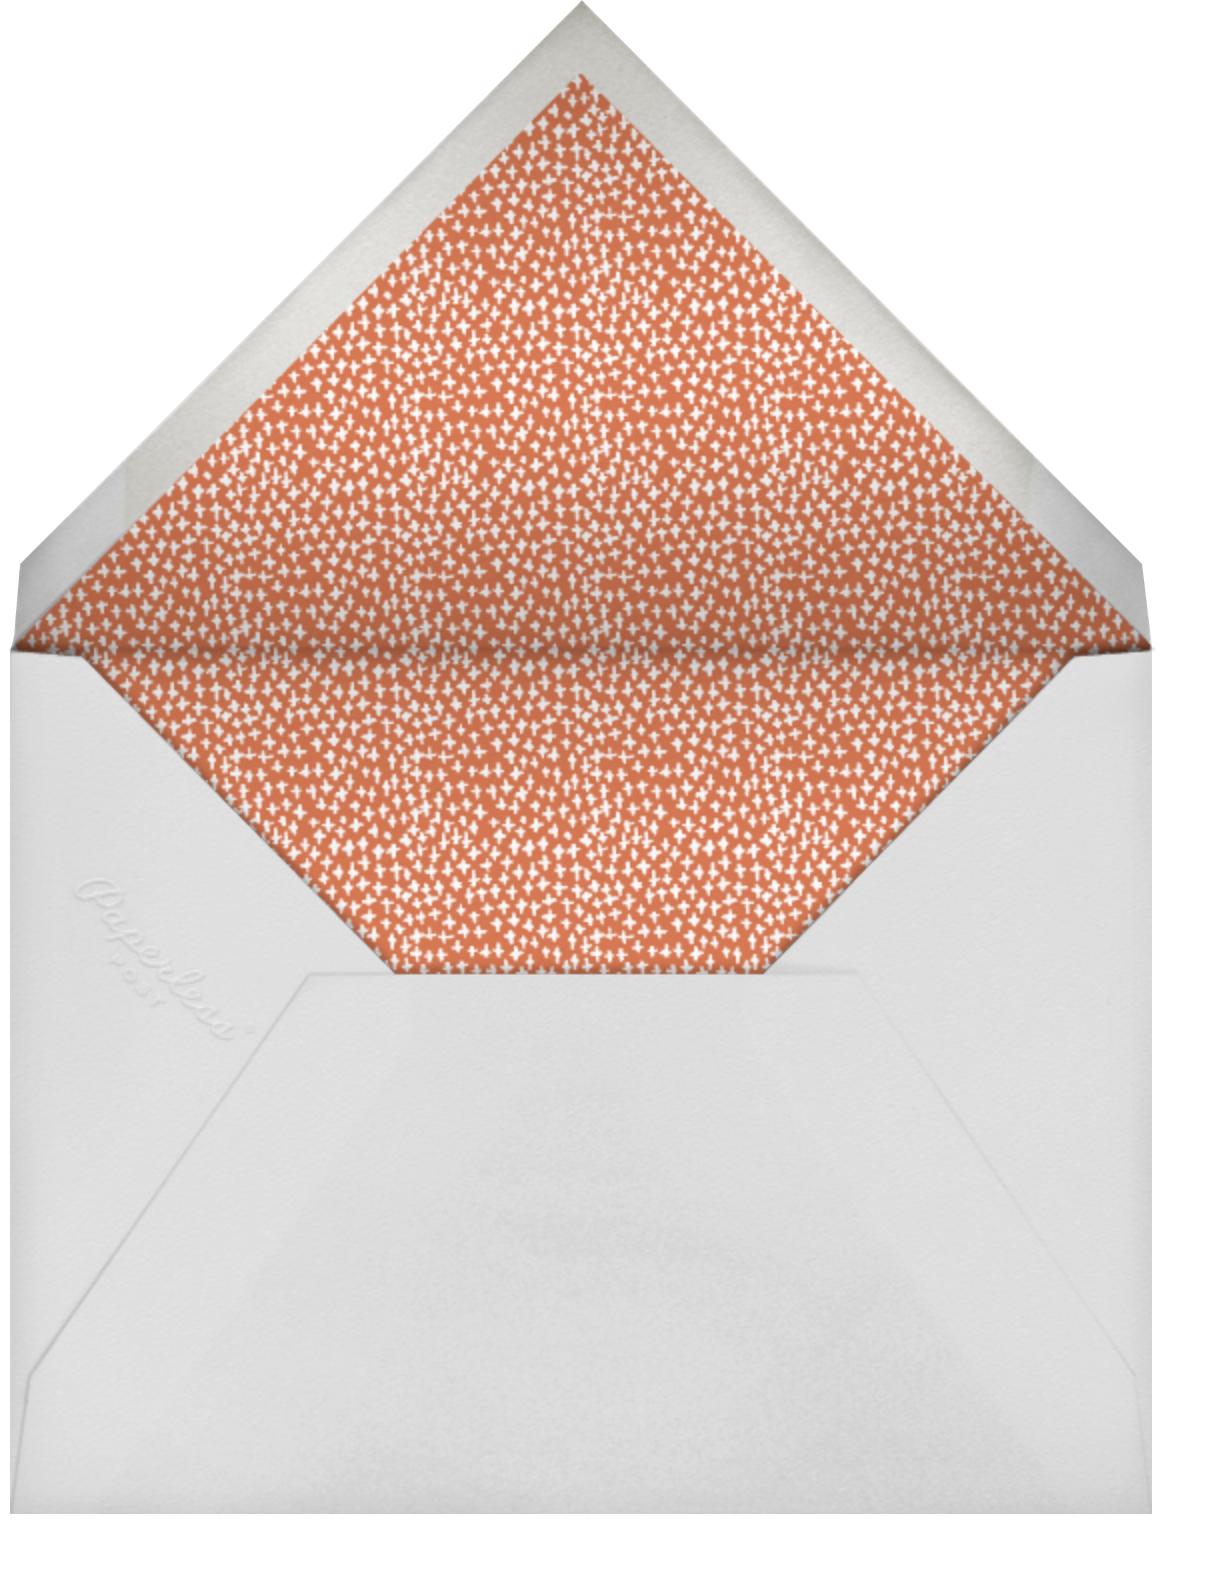 Prepare to Jibe - Pinks - Mr. Boddington's Studio - Envelope